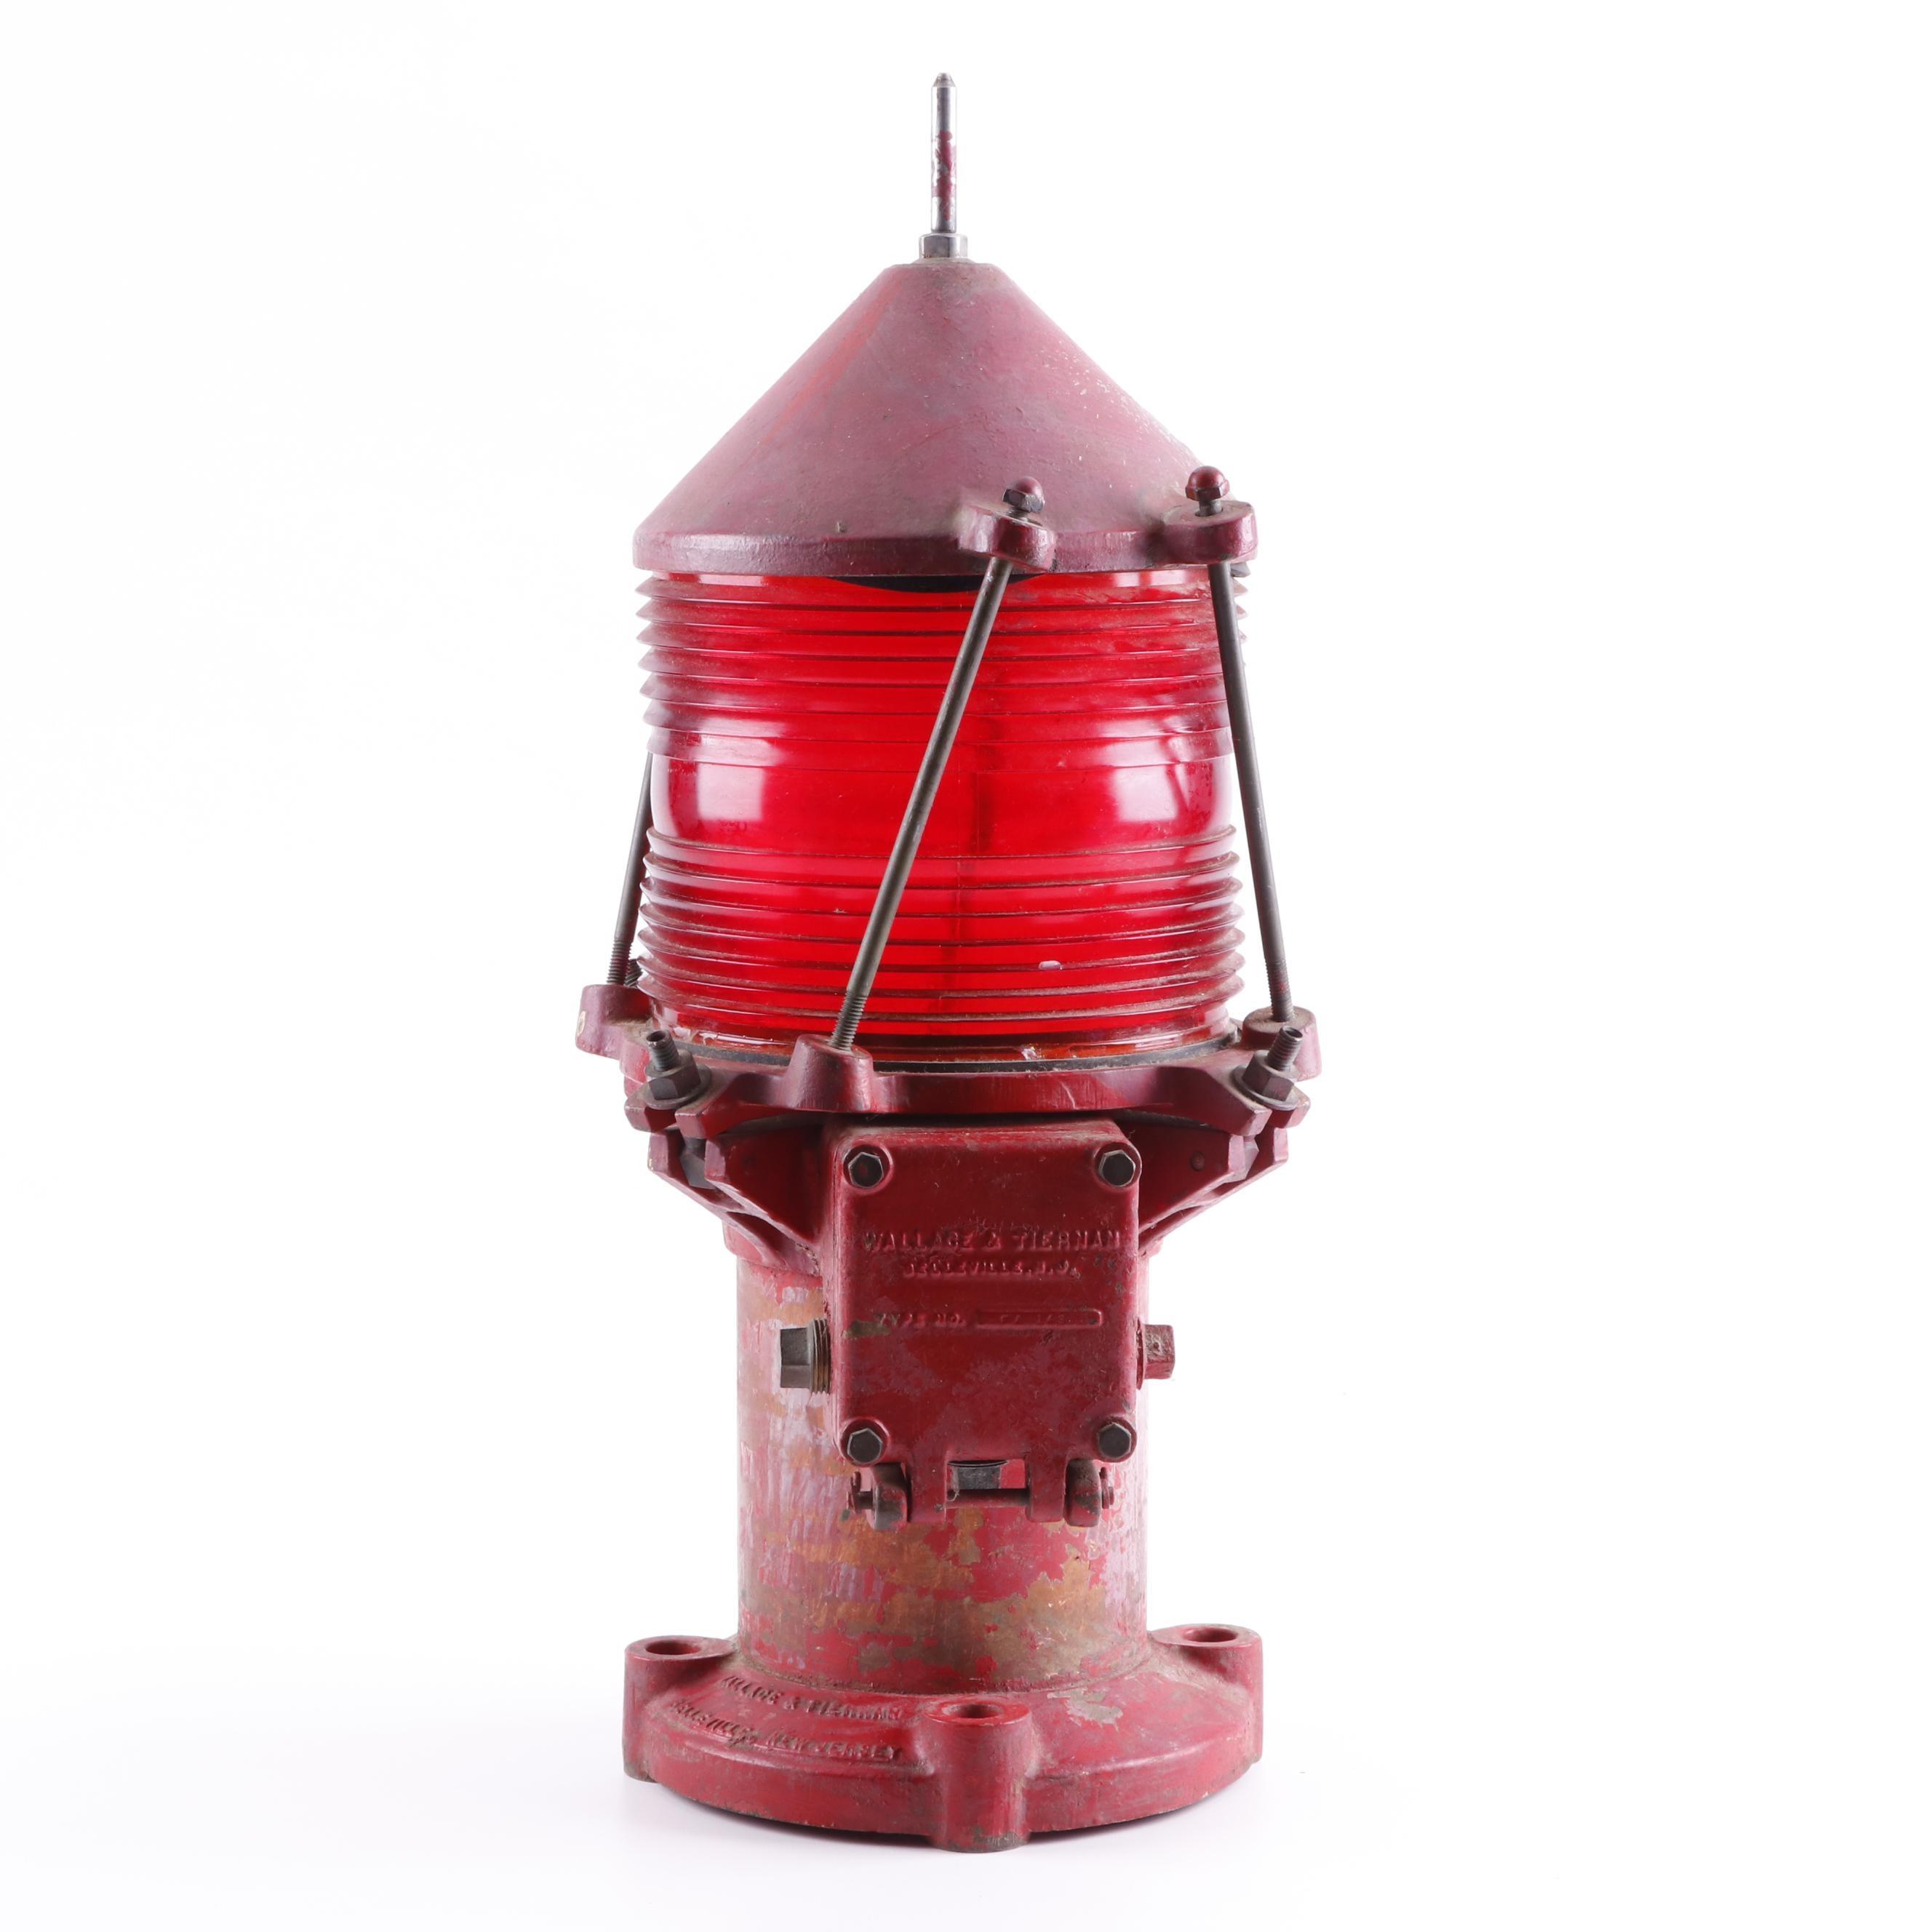 Wallace & Tiernan Nautical Buoy Light